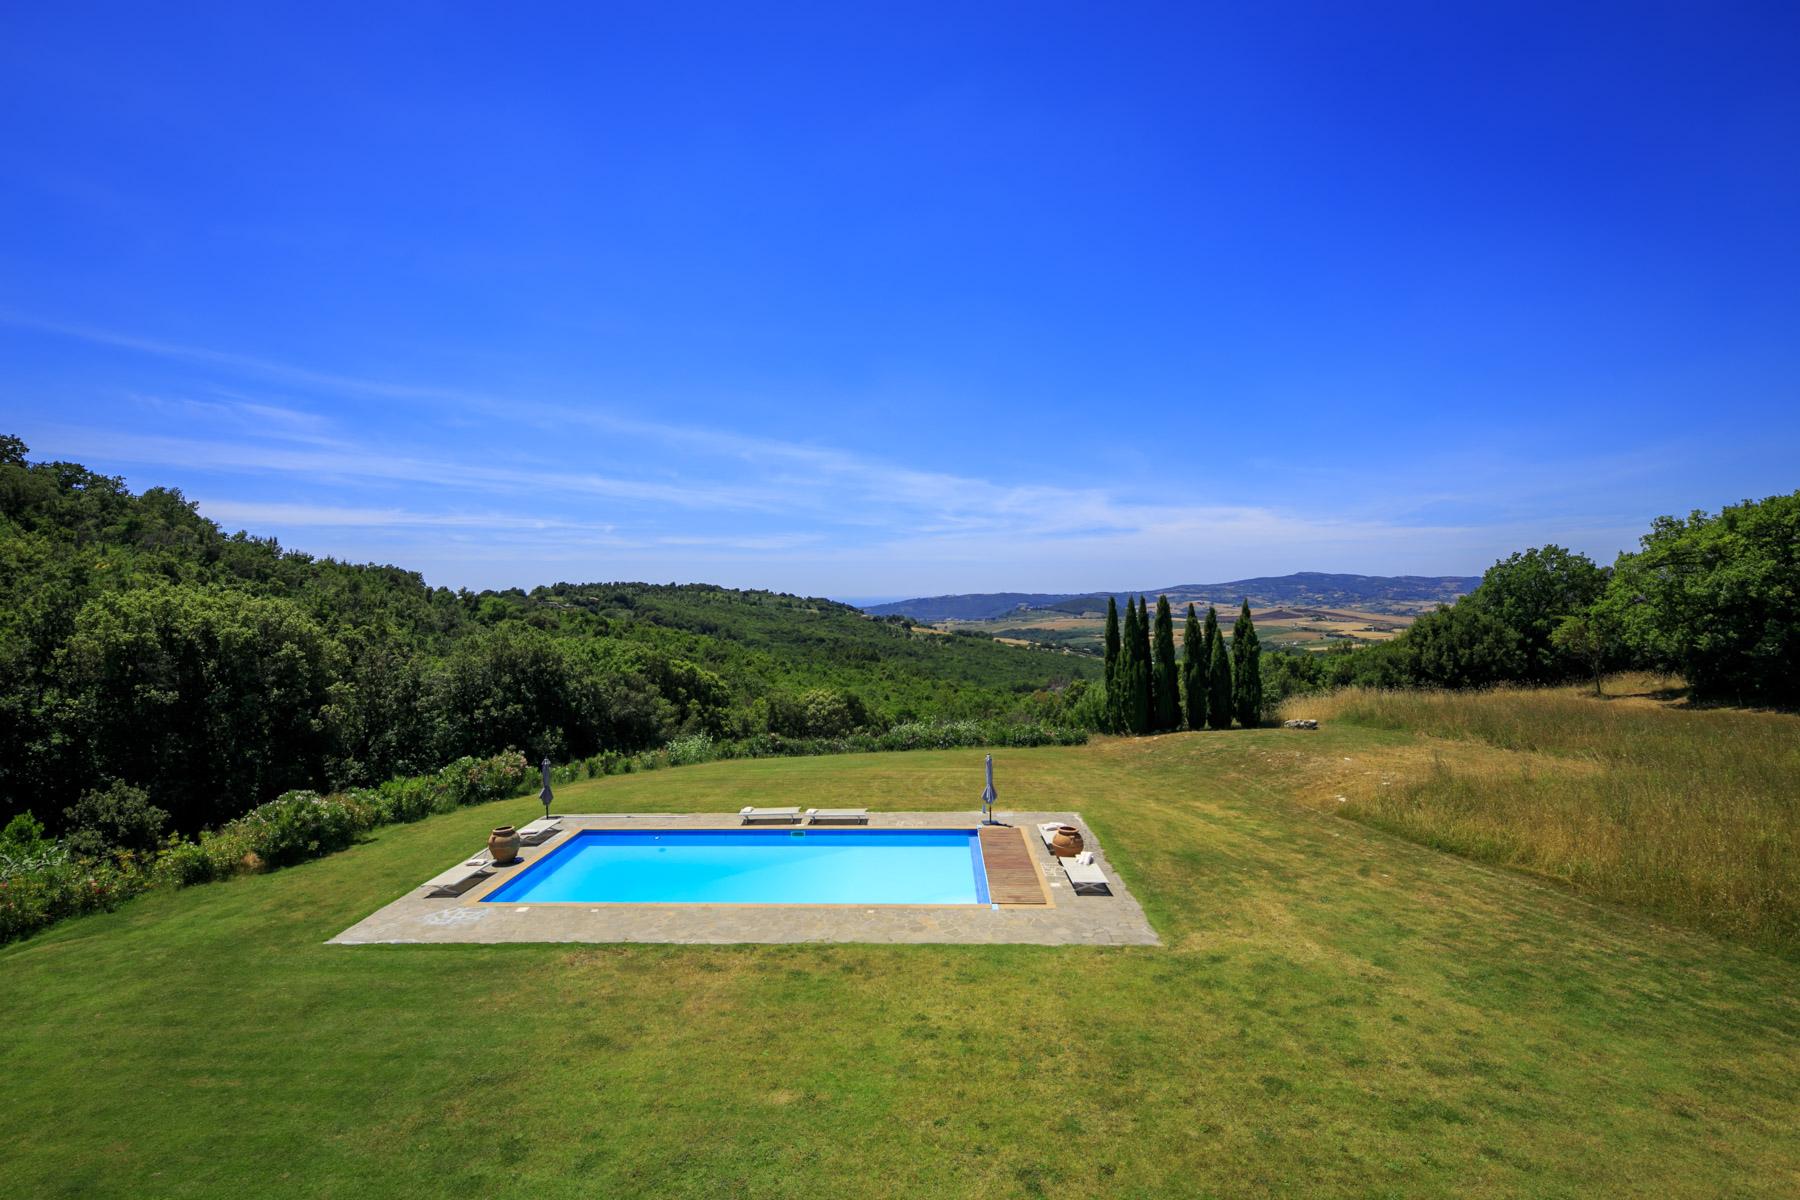 Villa in Vendita a Santa Luce: 5 locali, 270 mq - Foto 25